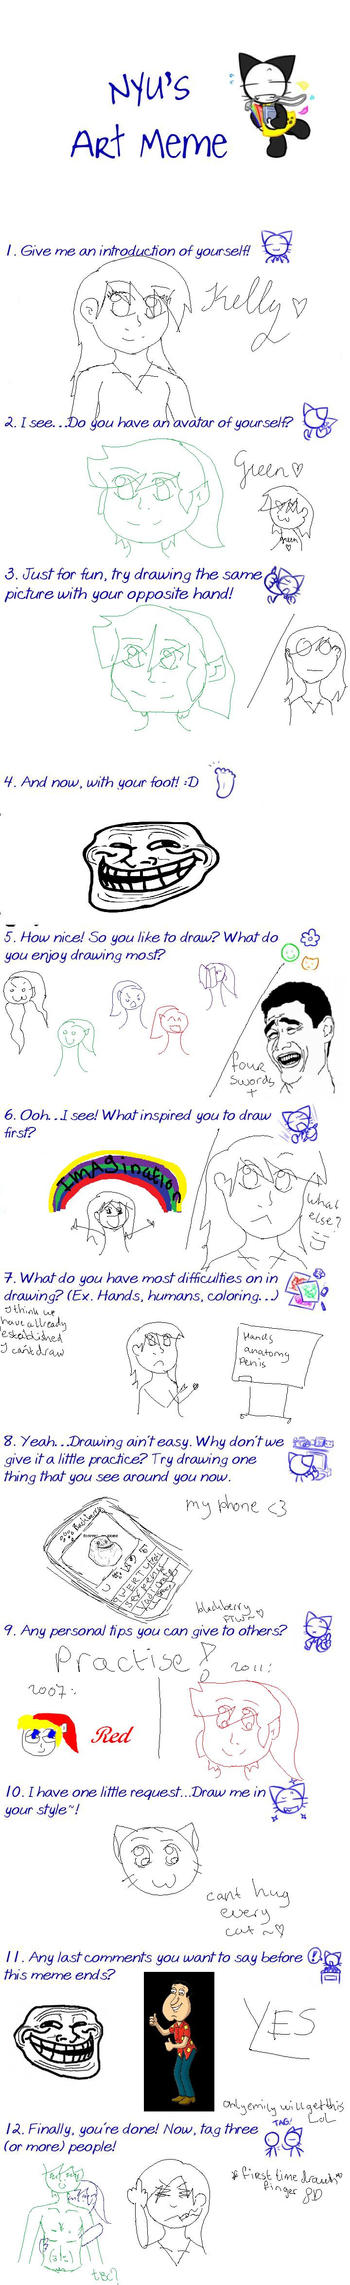 Nyu's Art Meme REDONE by Ketgirl1992